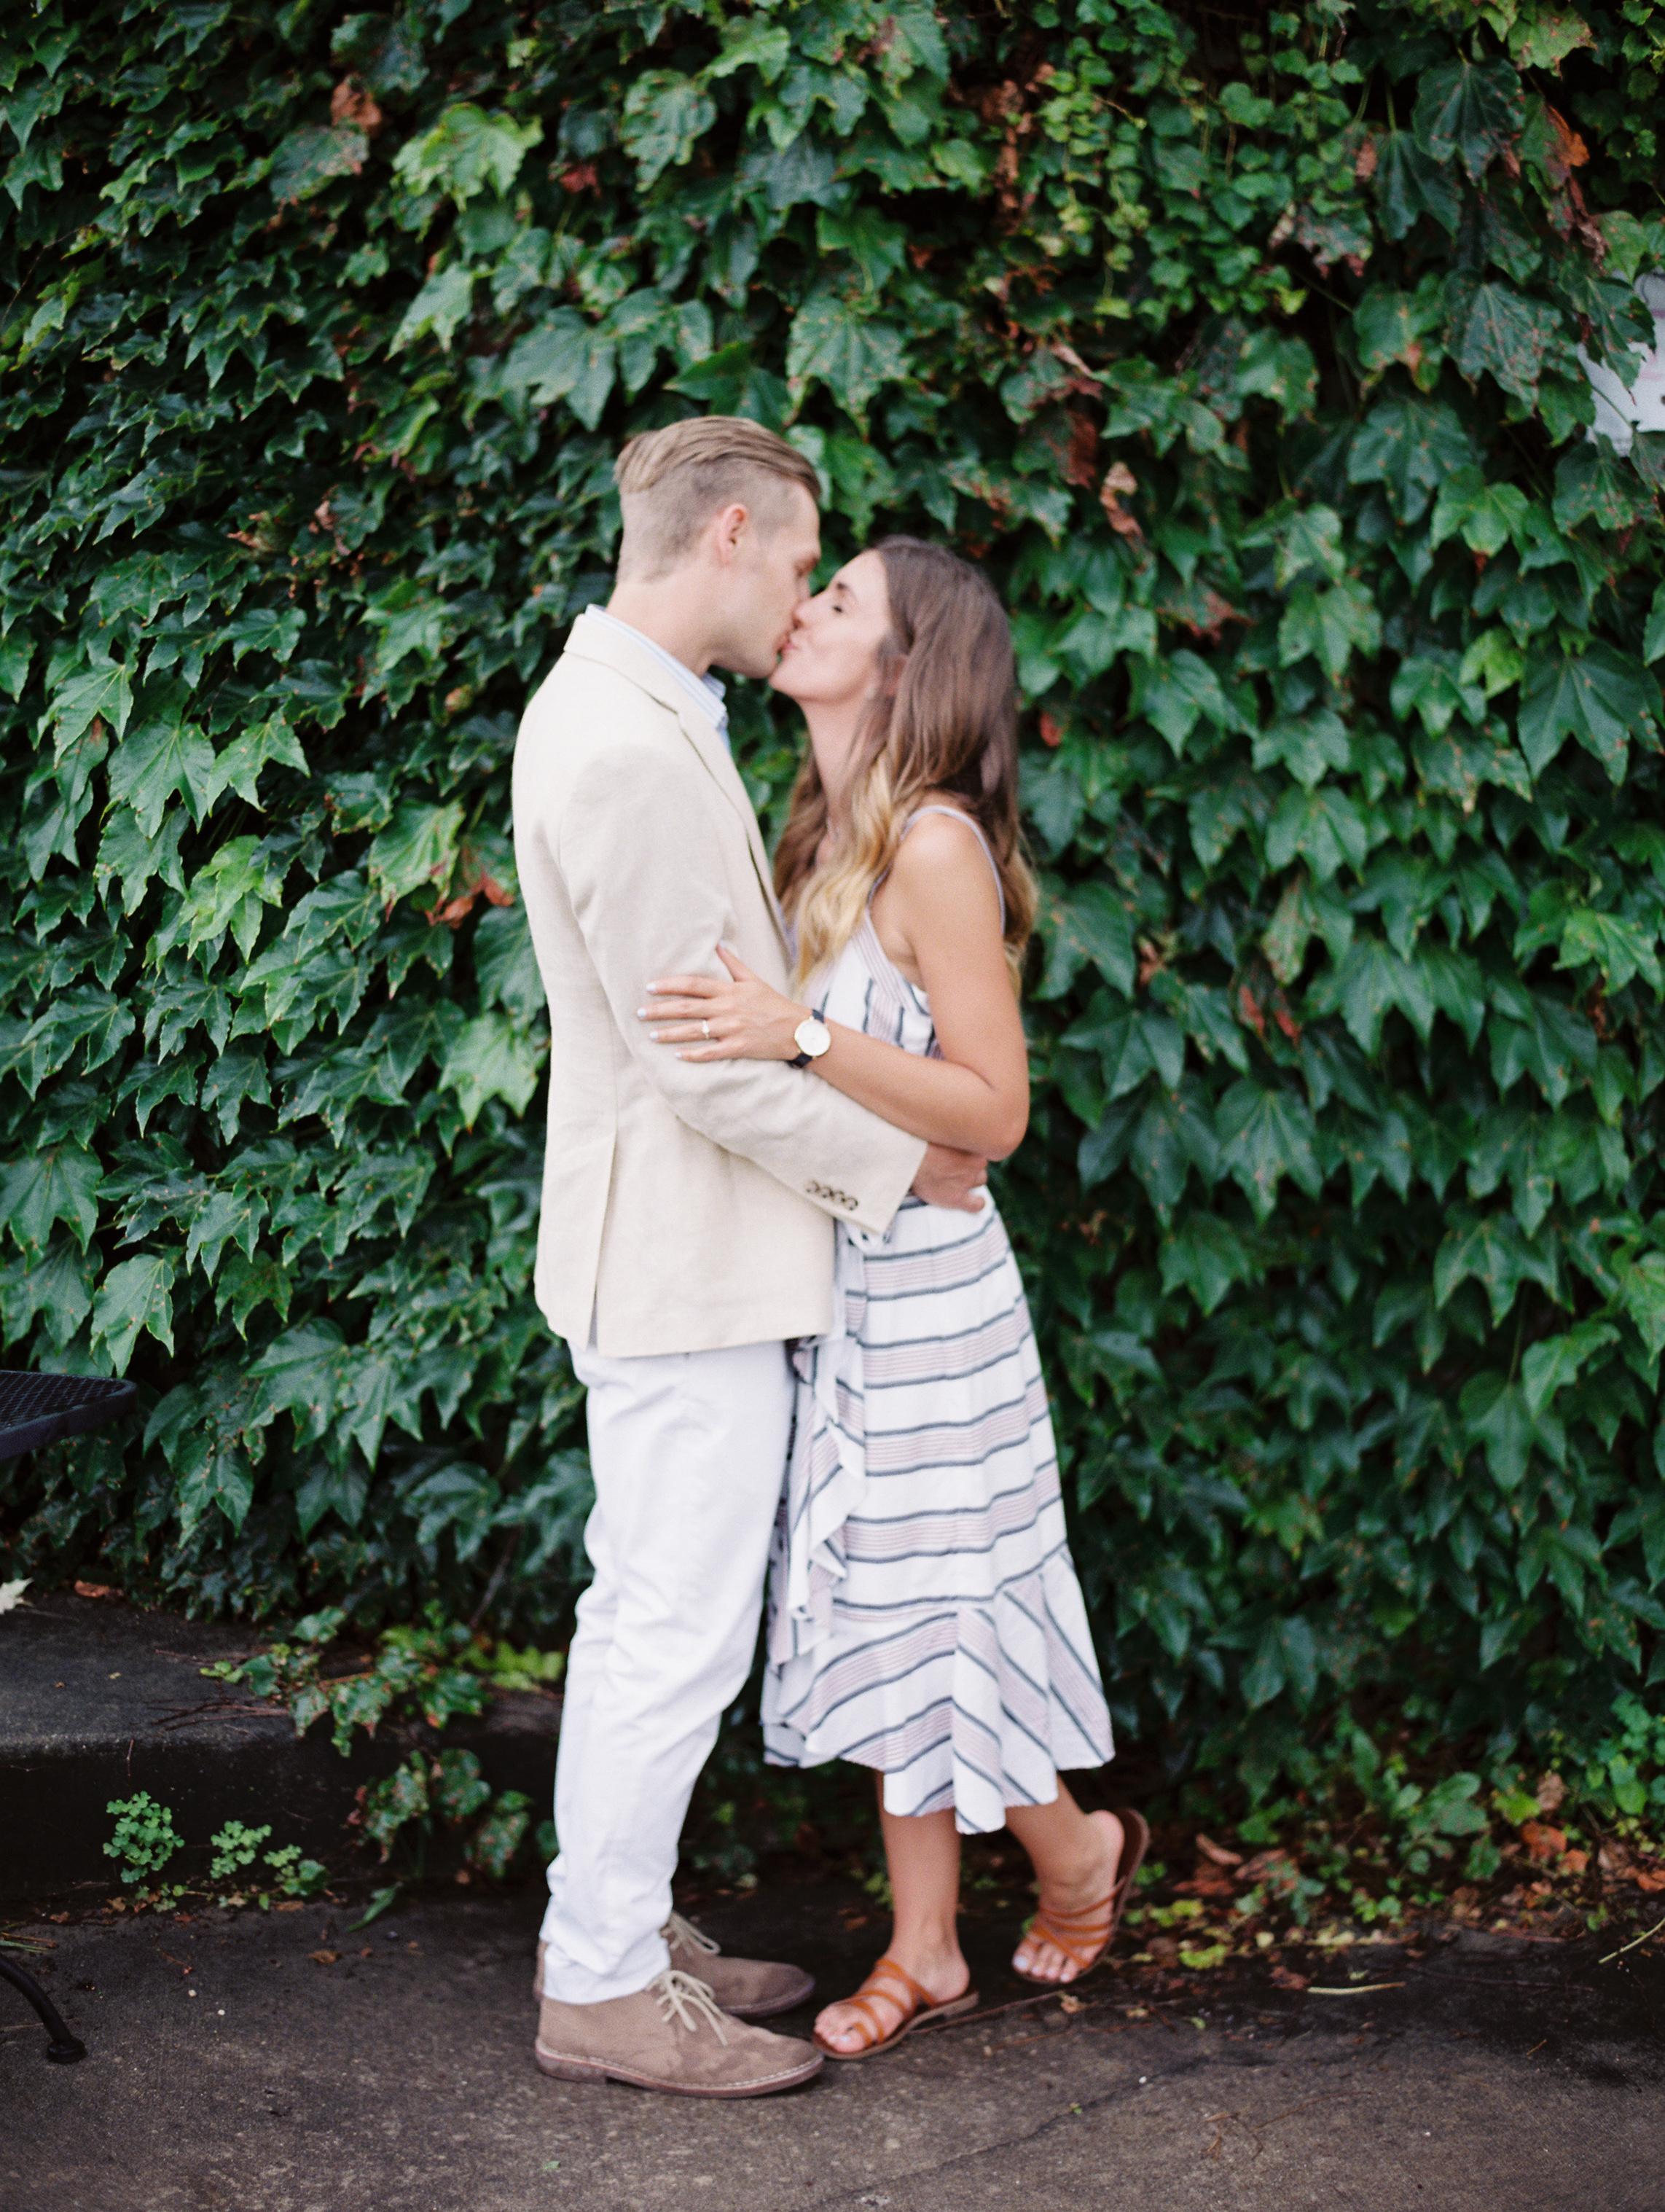 Kerri+Austin+Lavender+Field+Engagement-99.jpg